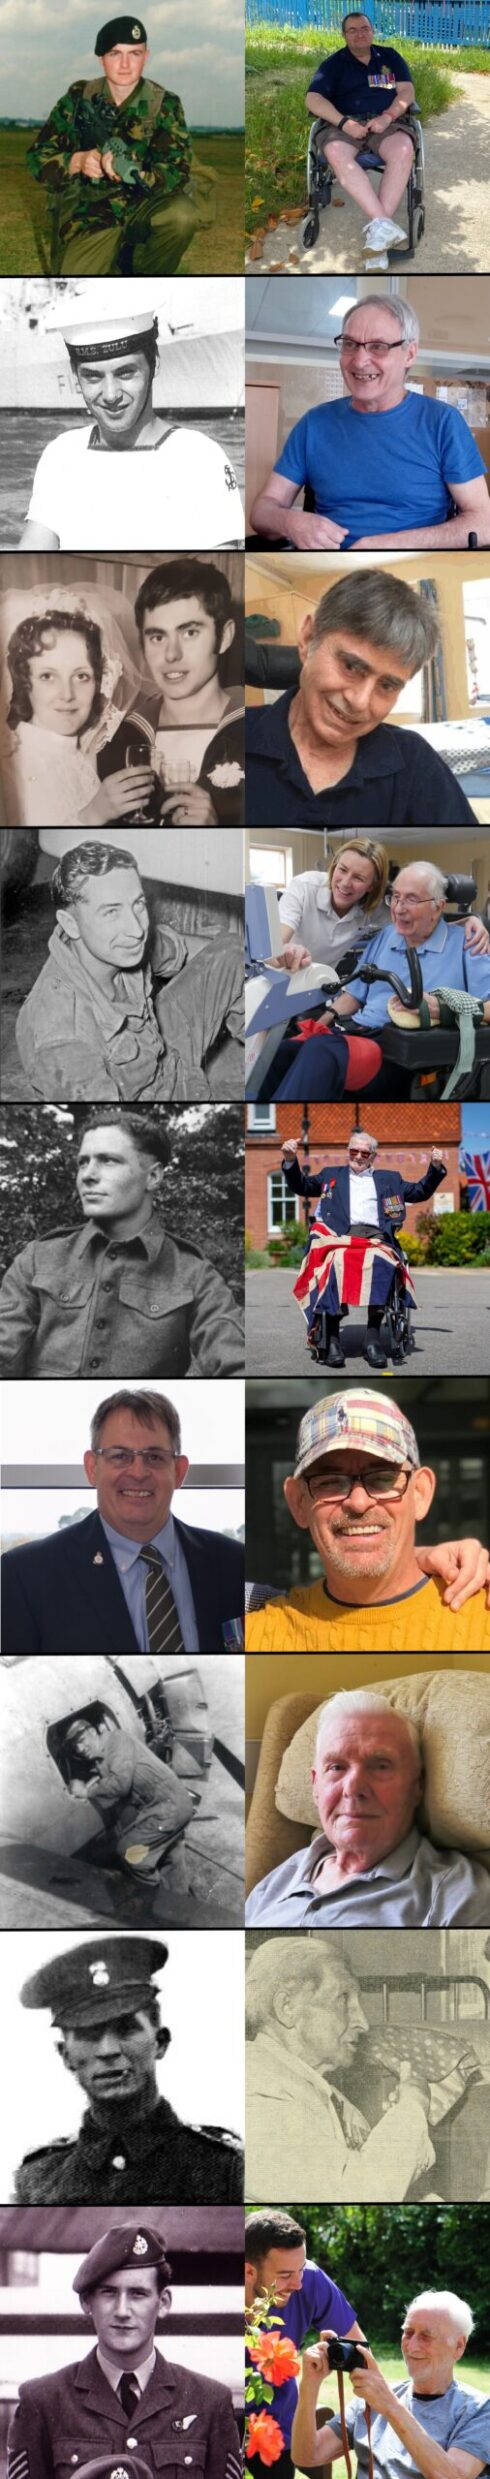 10 Veterans